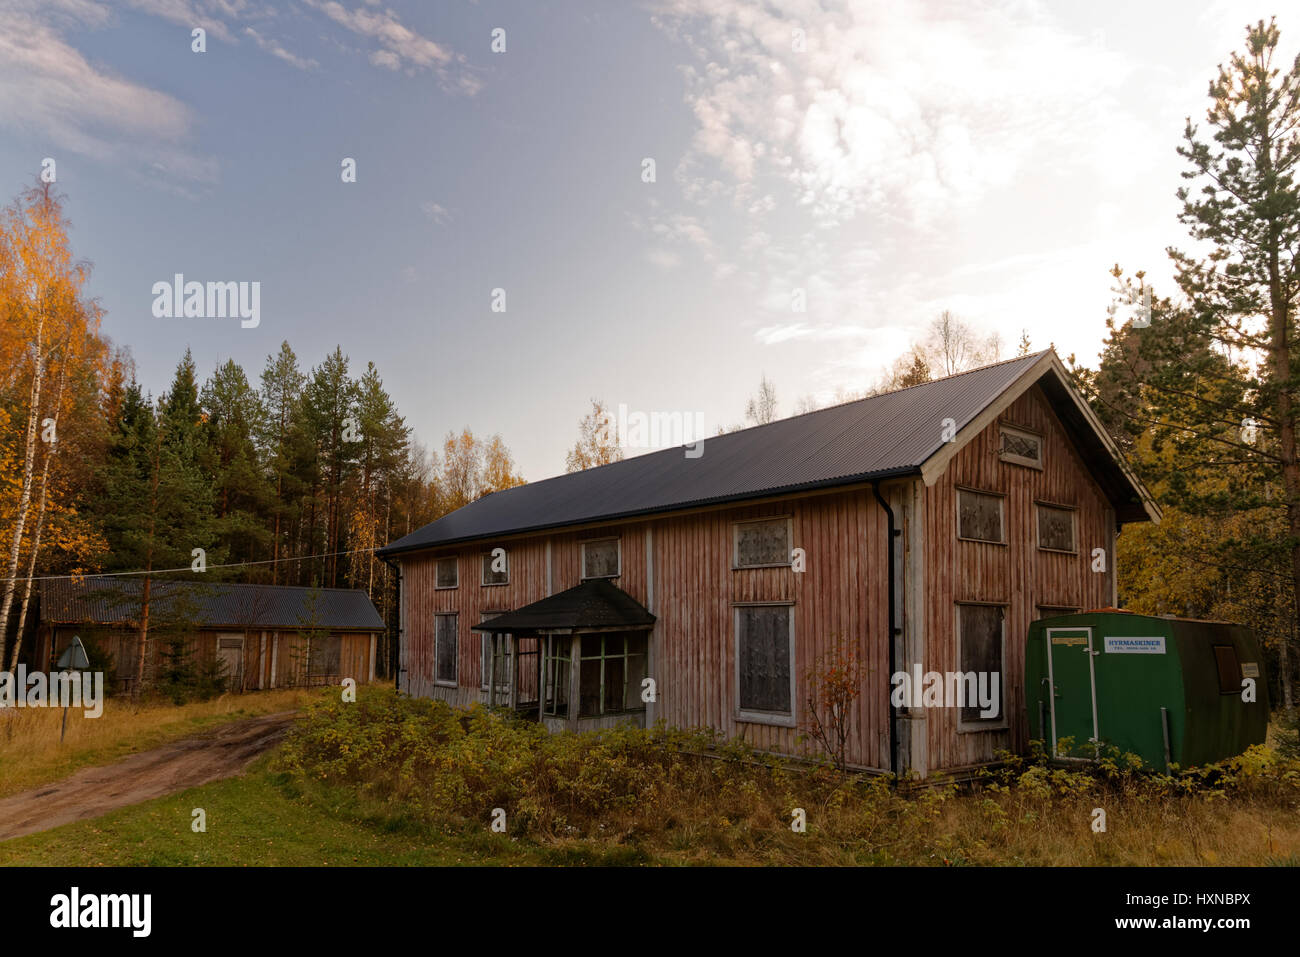 An old rotten house on Klubbviken island, in Luleå archipelago, northern Sweden - Stock Image